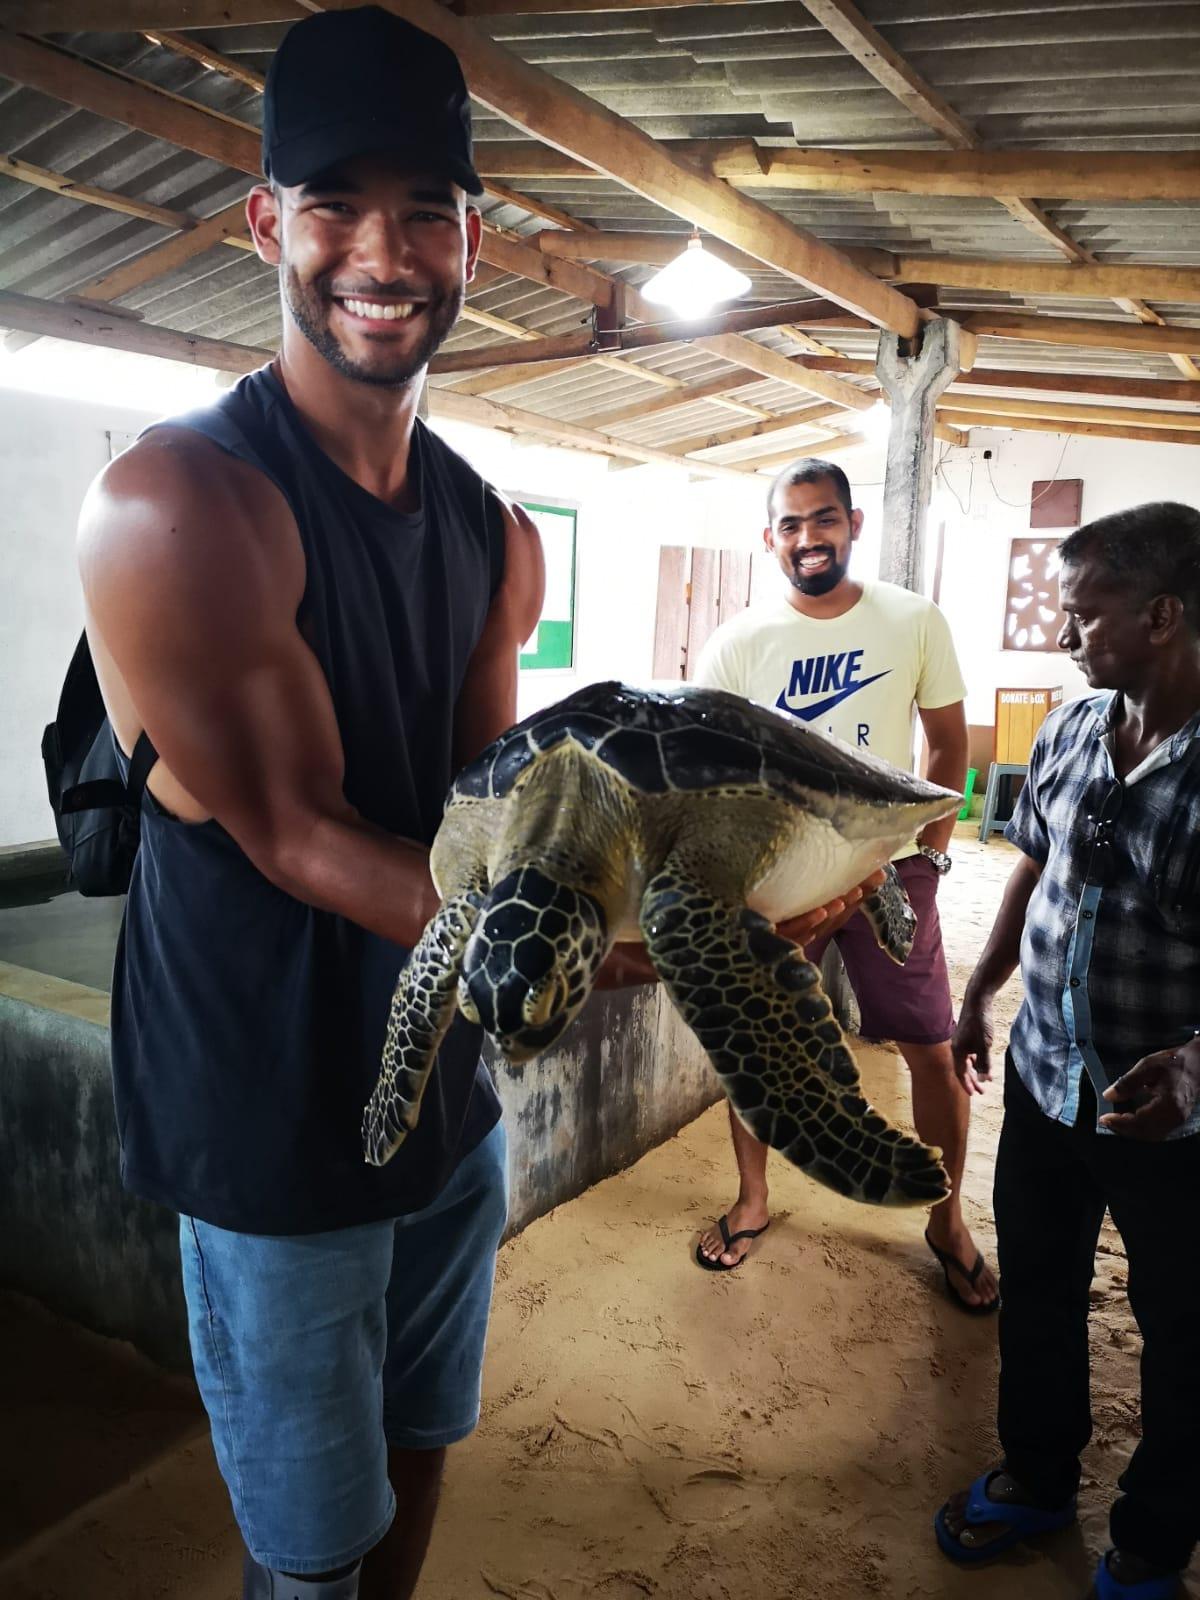 invite-to-paradise-sri-lanka-holiday-honeymoon-specialists-customer-feedback-elin-jordan-luce-sea-turtle-hatchery.JPG